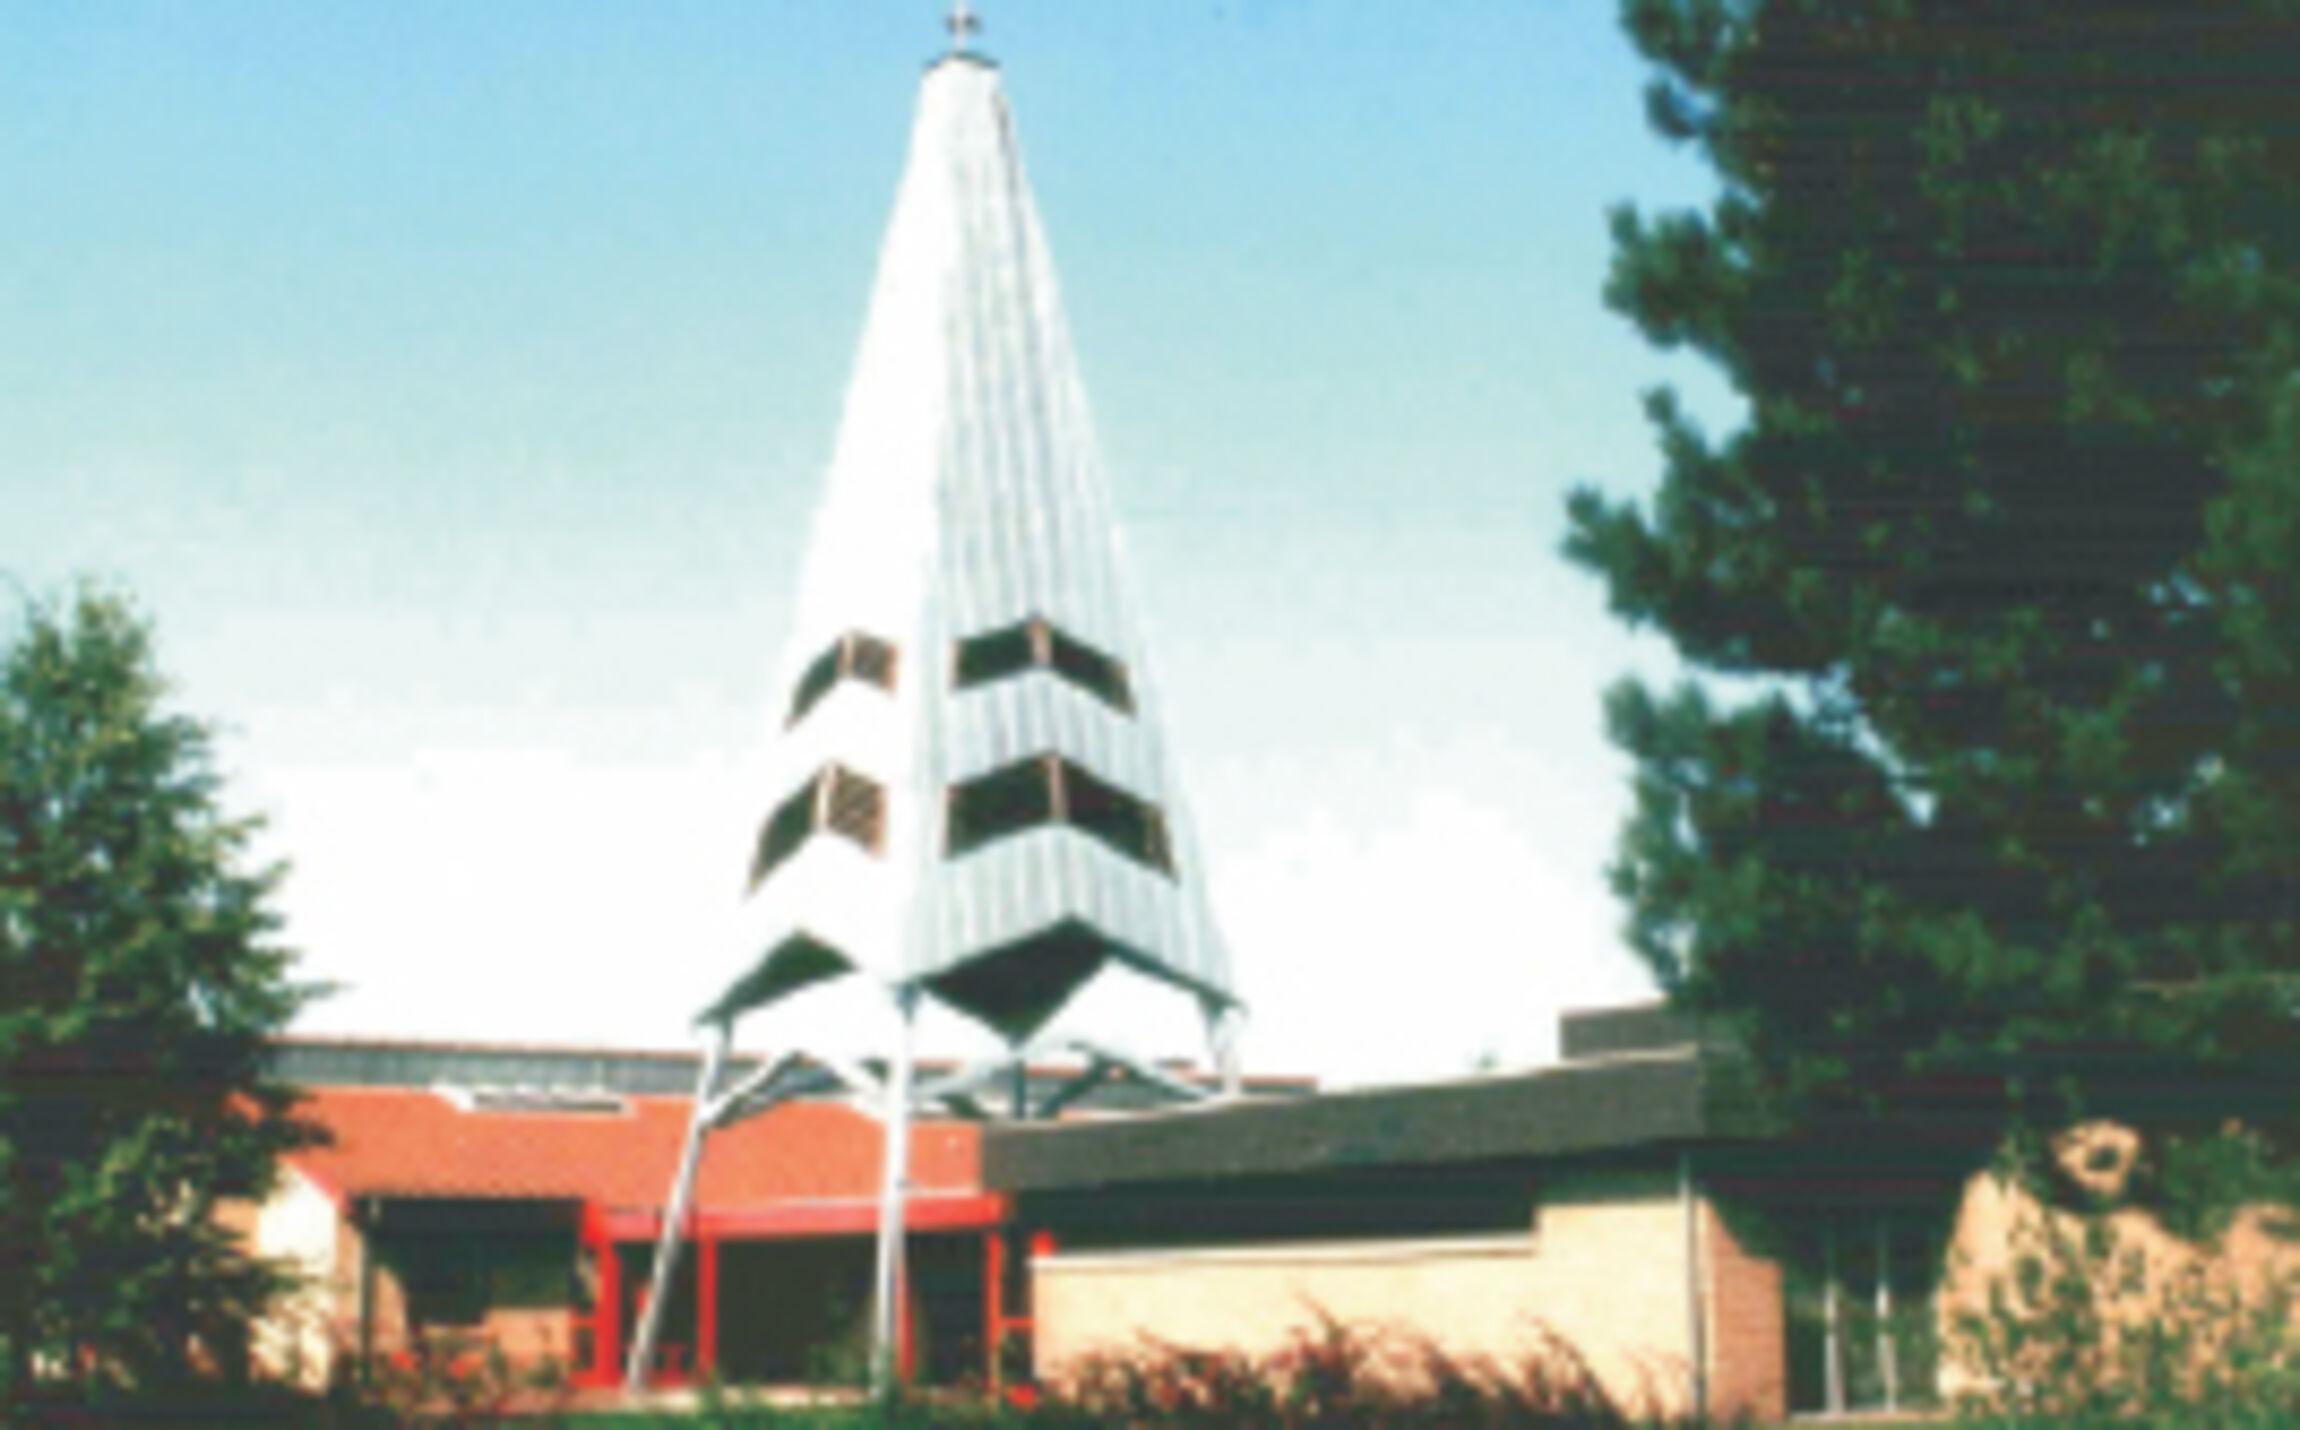 Herzlake Christuskirche